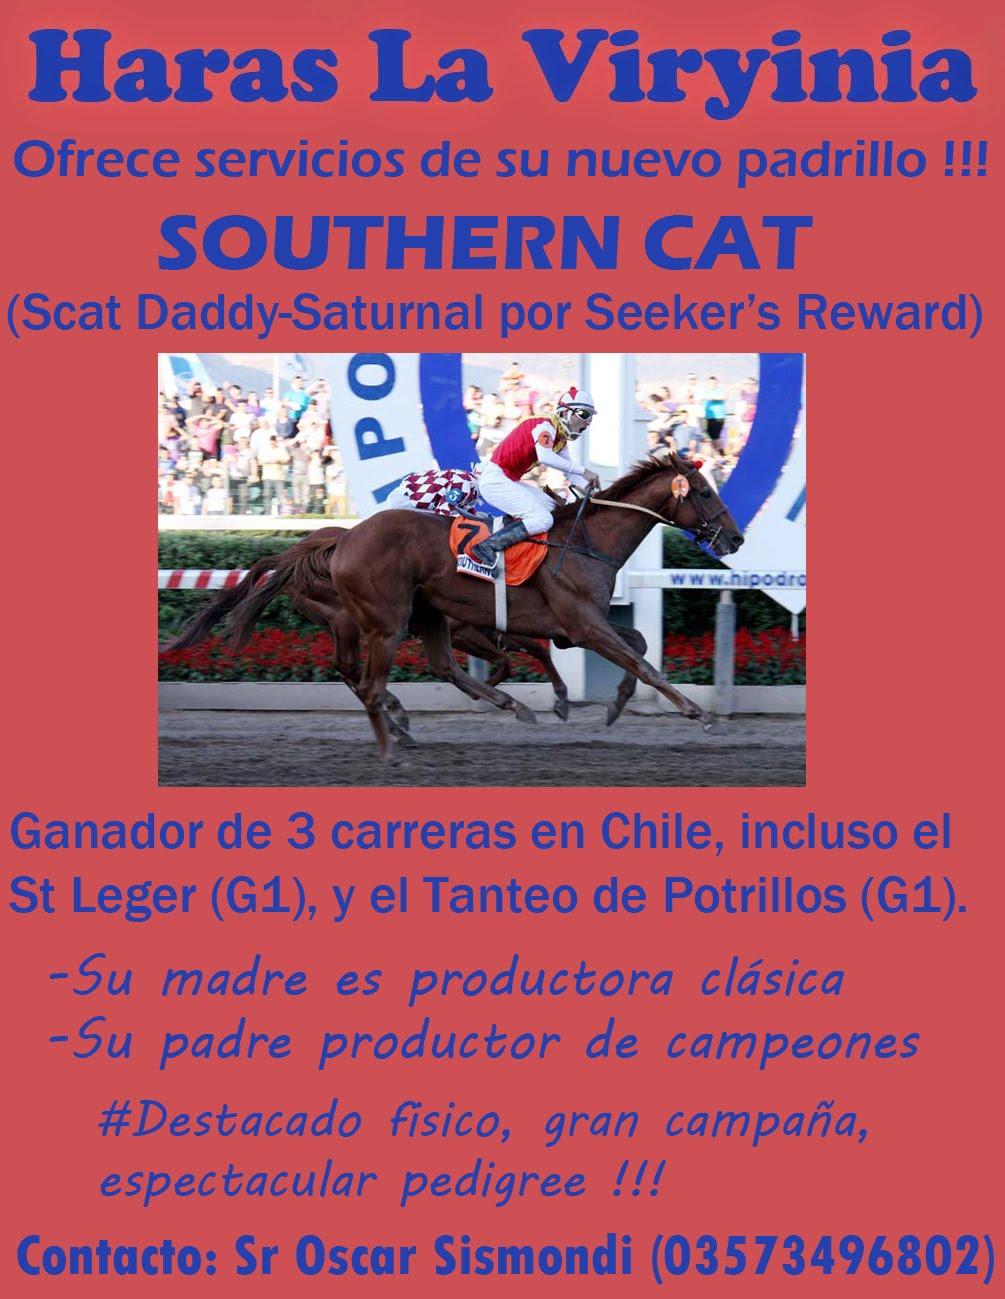 HS LA VIRYINIA SOUTHERN CAT